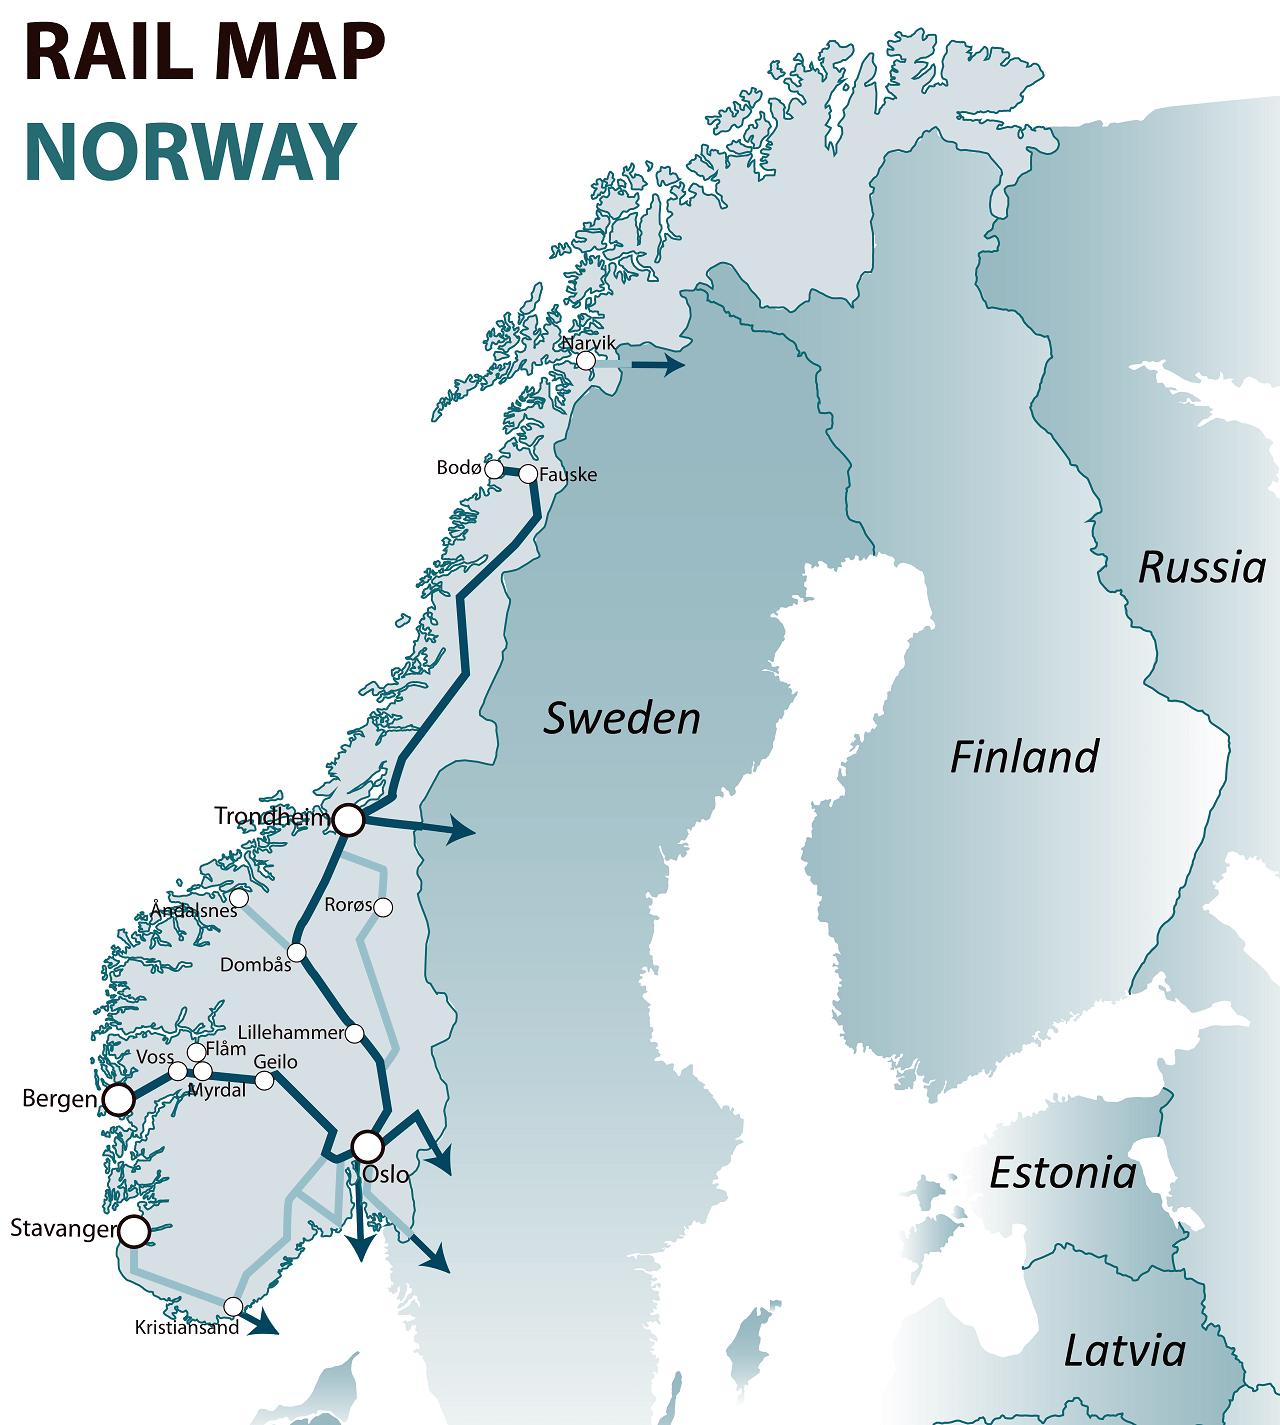 Noway rail map